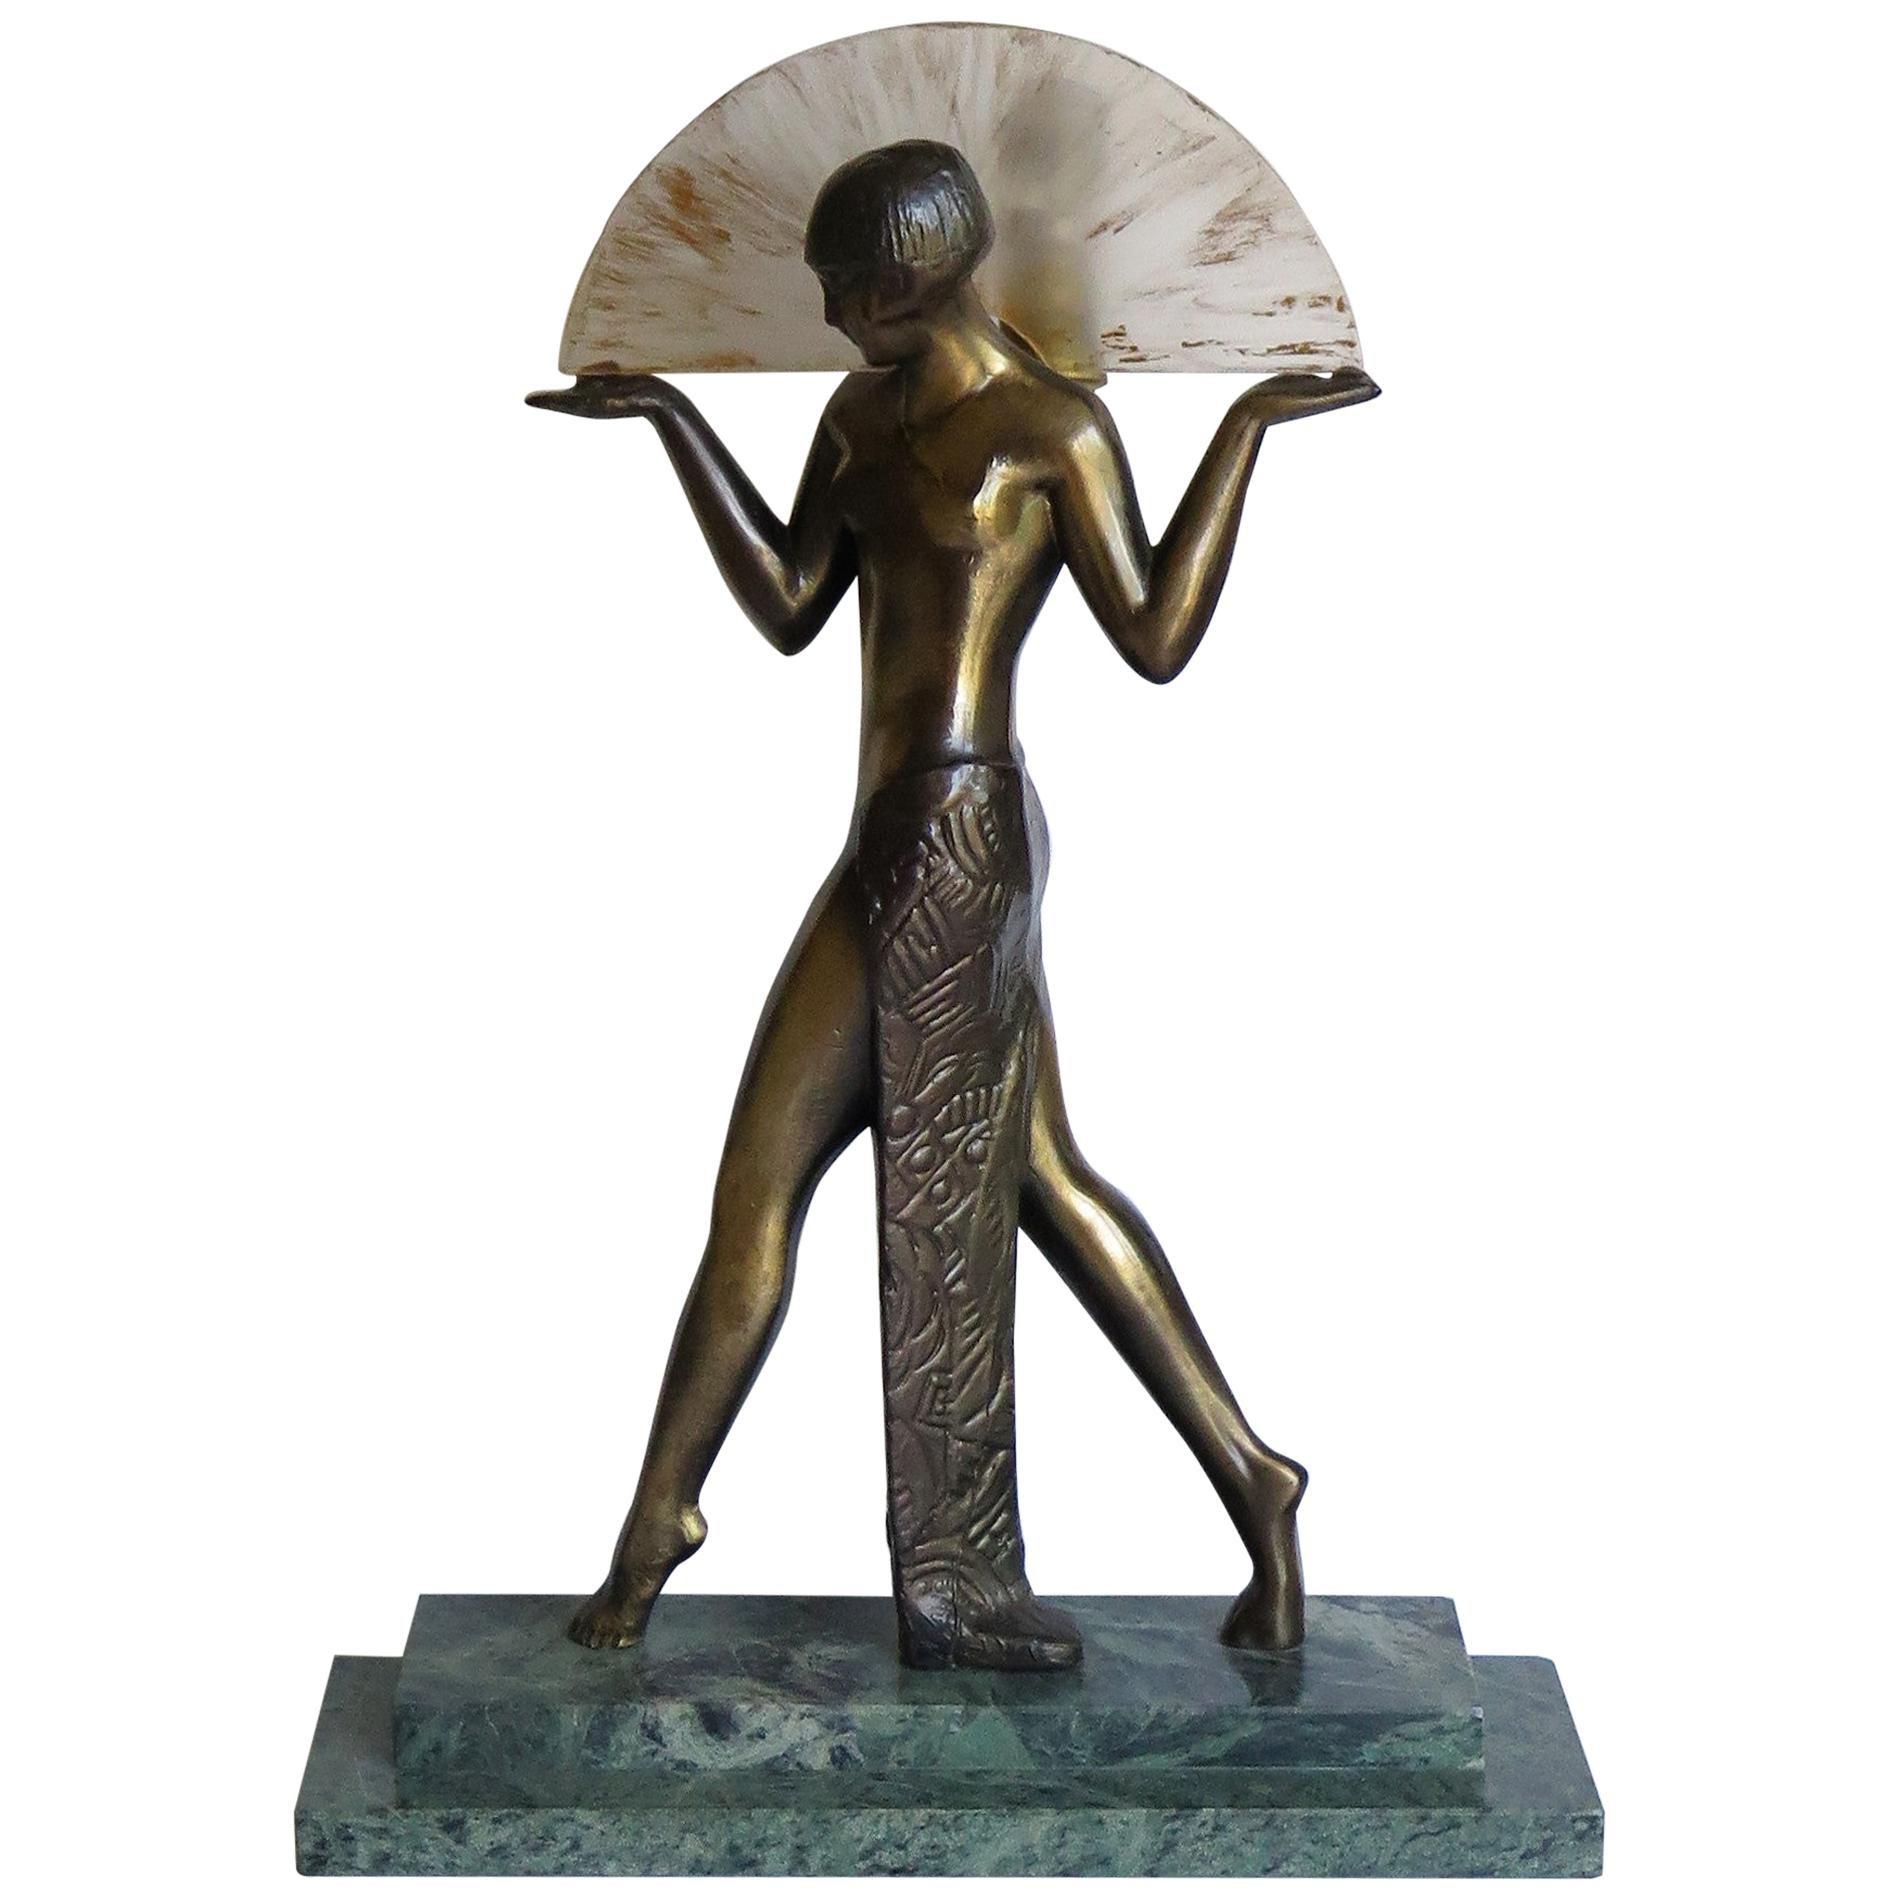 Art Deco Style Fan Dancer Figurine Lamp after Max Le Verrier, Mid-20th Century